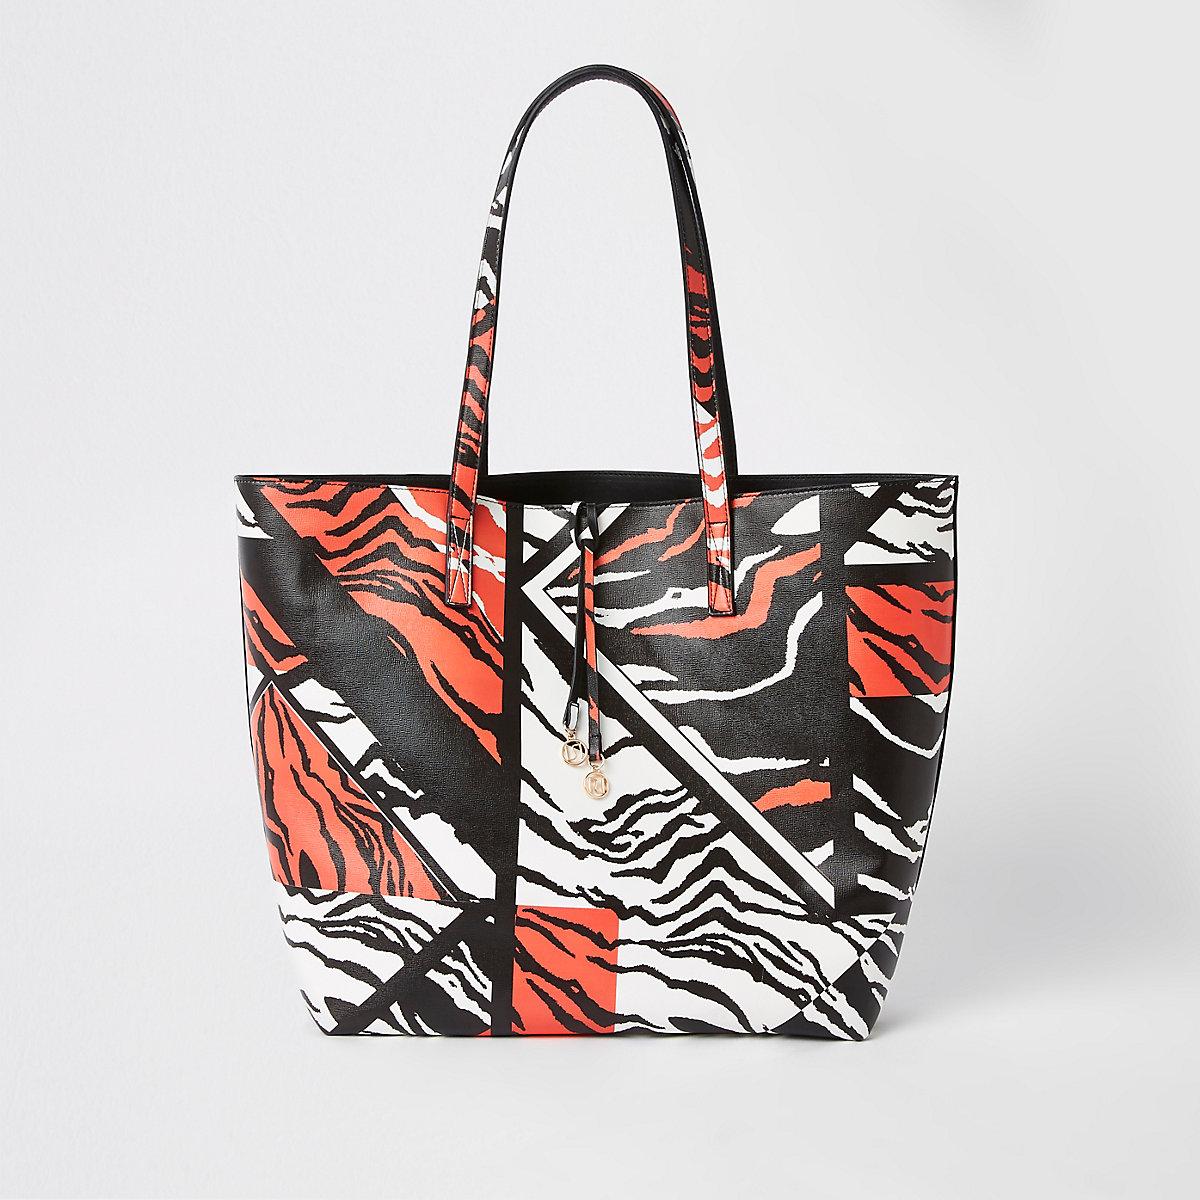 Red zebra print tote bag